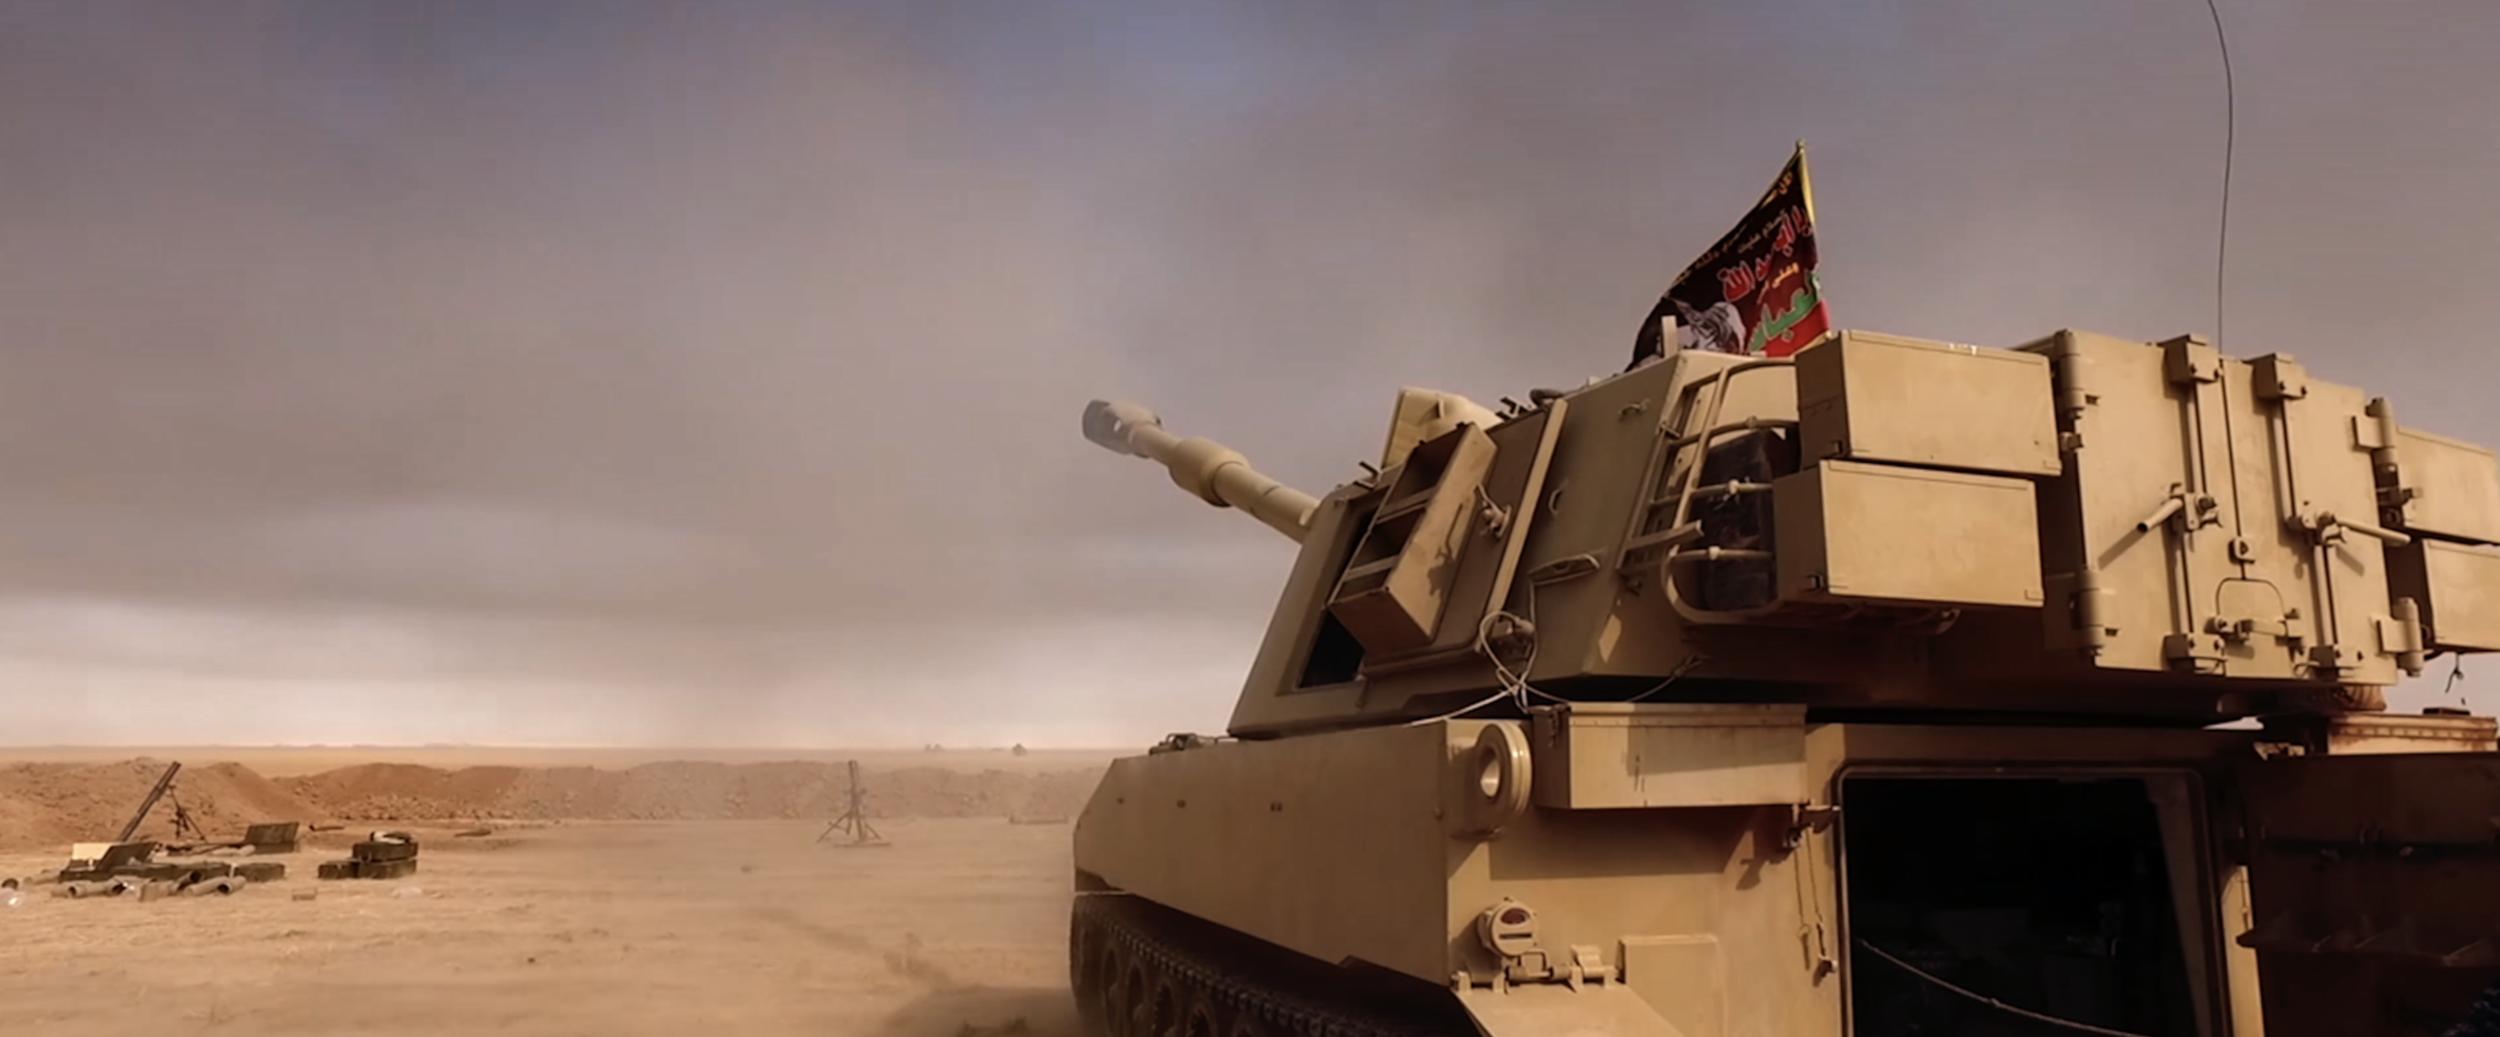 Humvee tank under smoky sky.png